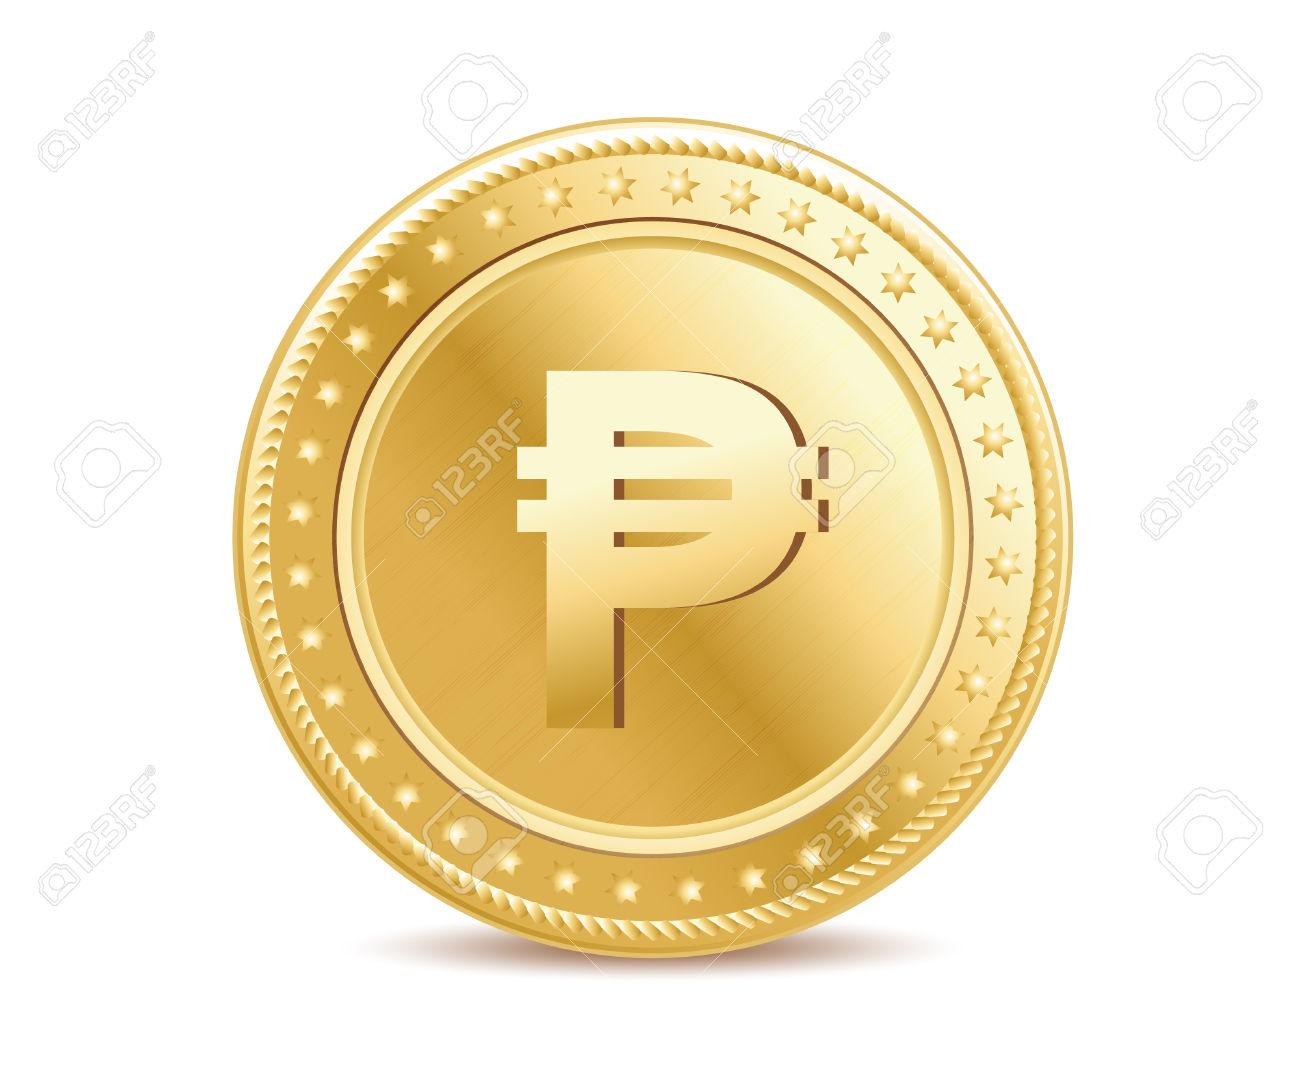 Peso Coin Clipart.